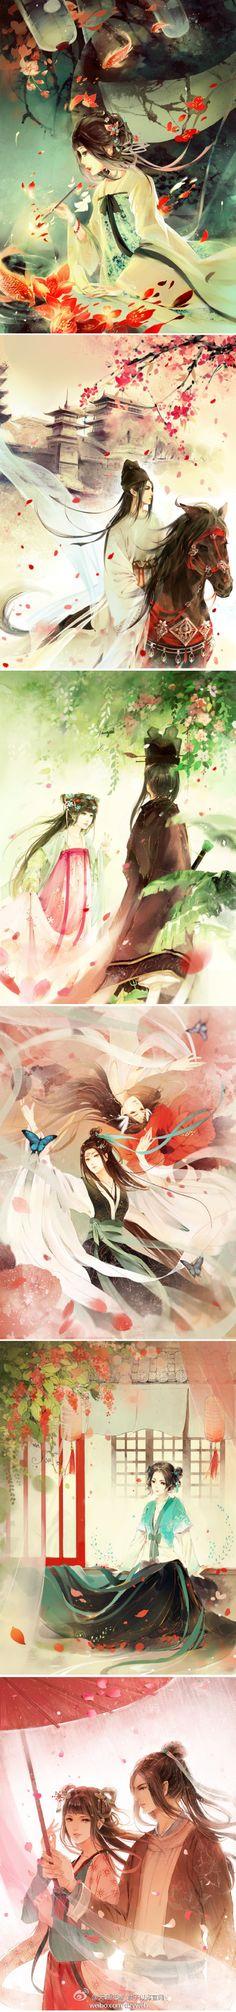 91bd7092dfaaae2d5e3db3a70e819b17f936ce8e98ee3-mNCmIl_fw658 (440×3753) Illustrations, Graphic Illustration, Manga Art, Anime Art, Chinese Painting, Chinese Artwork, Japanese Artwork, China Art, Human Art